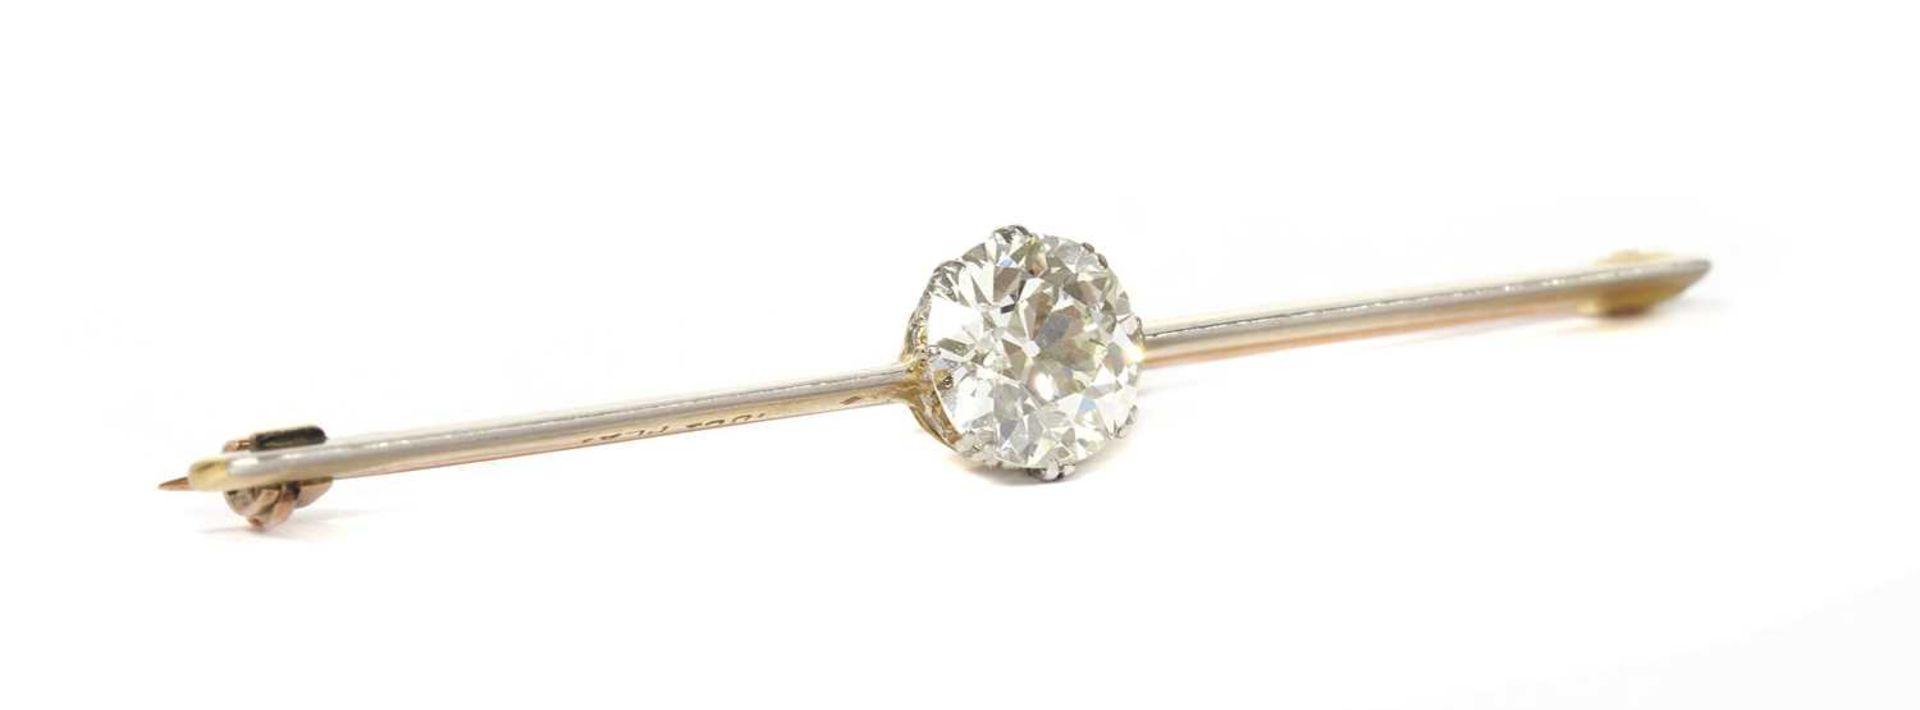 A gold and platinum single stone diamond bar brooch,